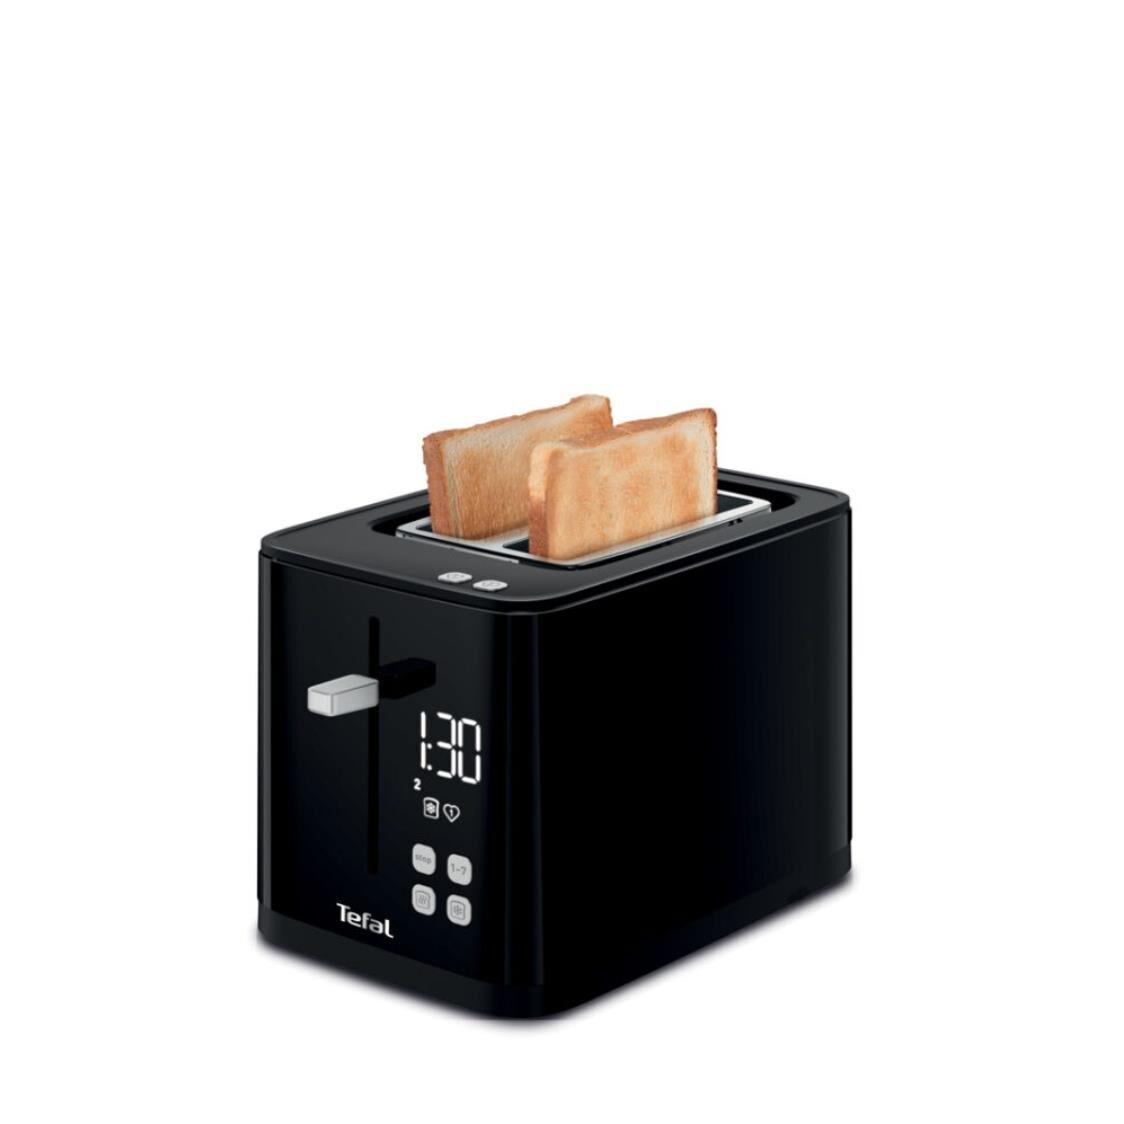 Tefal Digital Black Toaster 2S